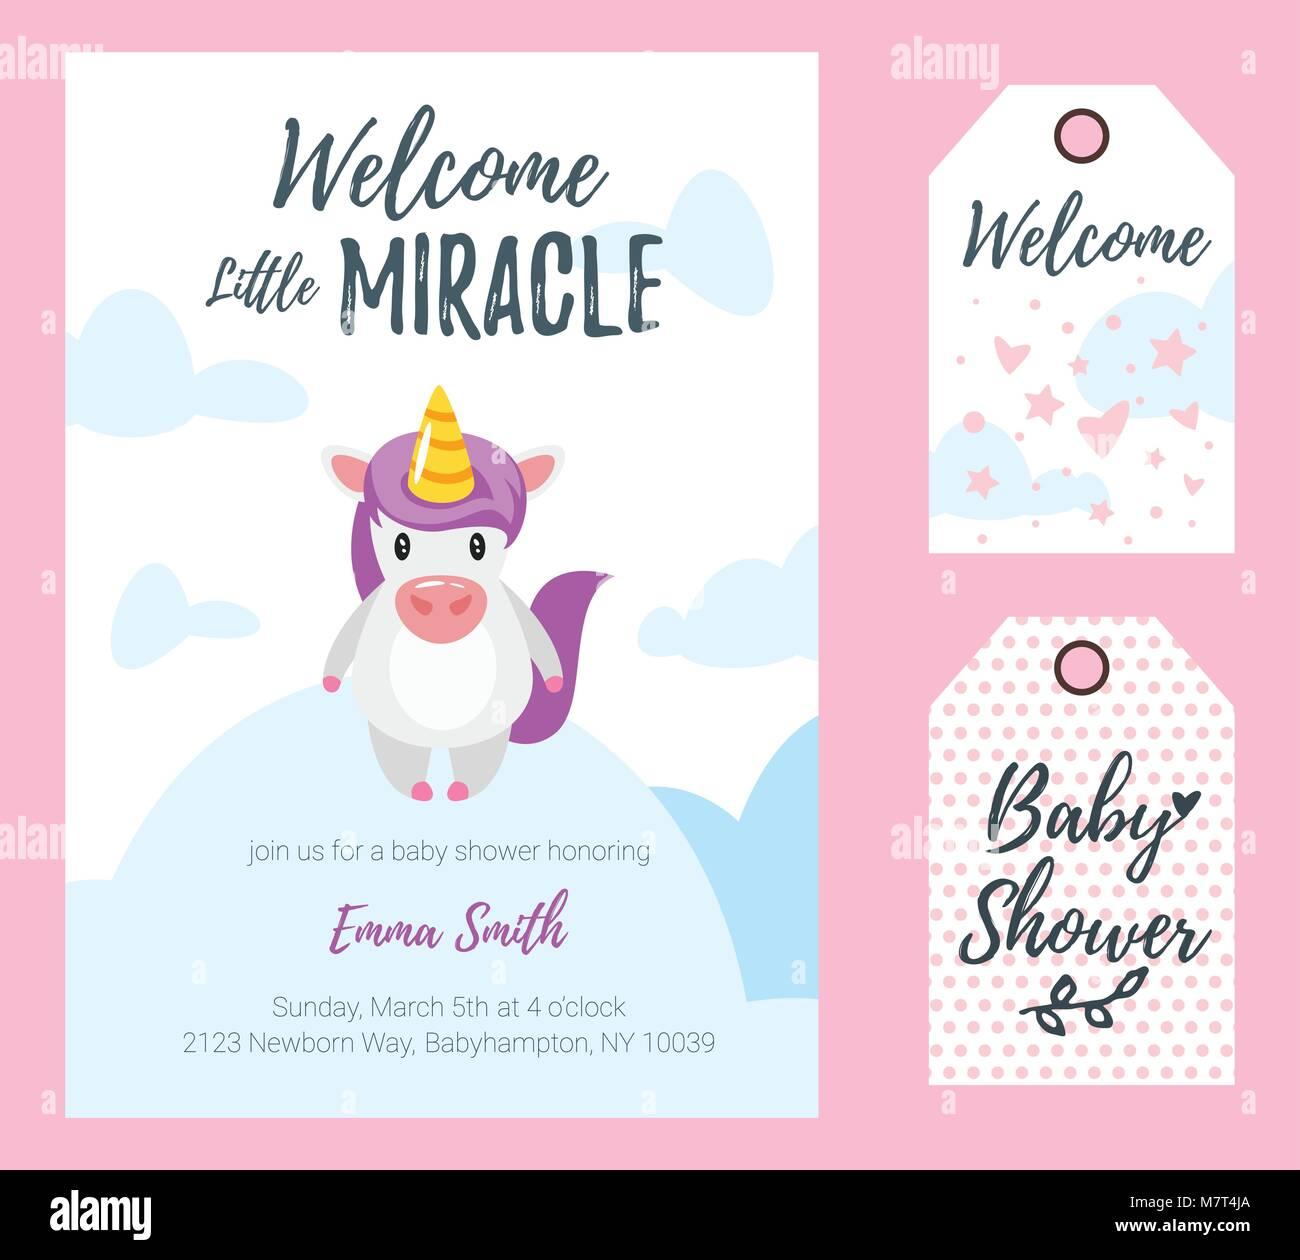 Vector cartoon style illustration of Baby shower invitation Stock ...